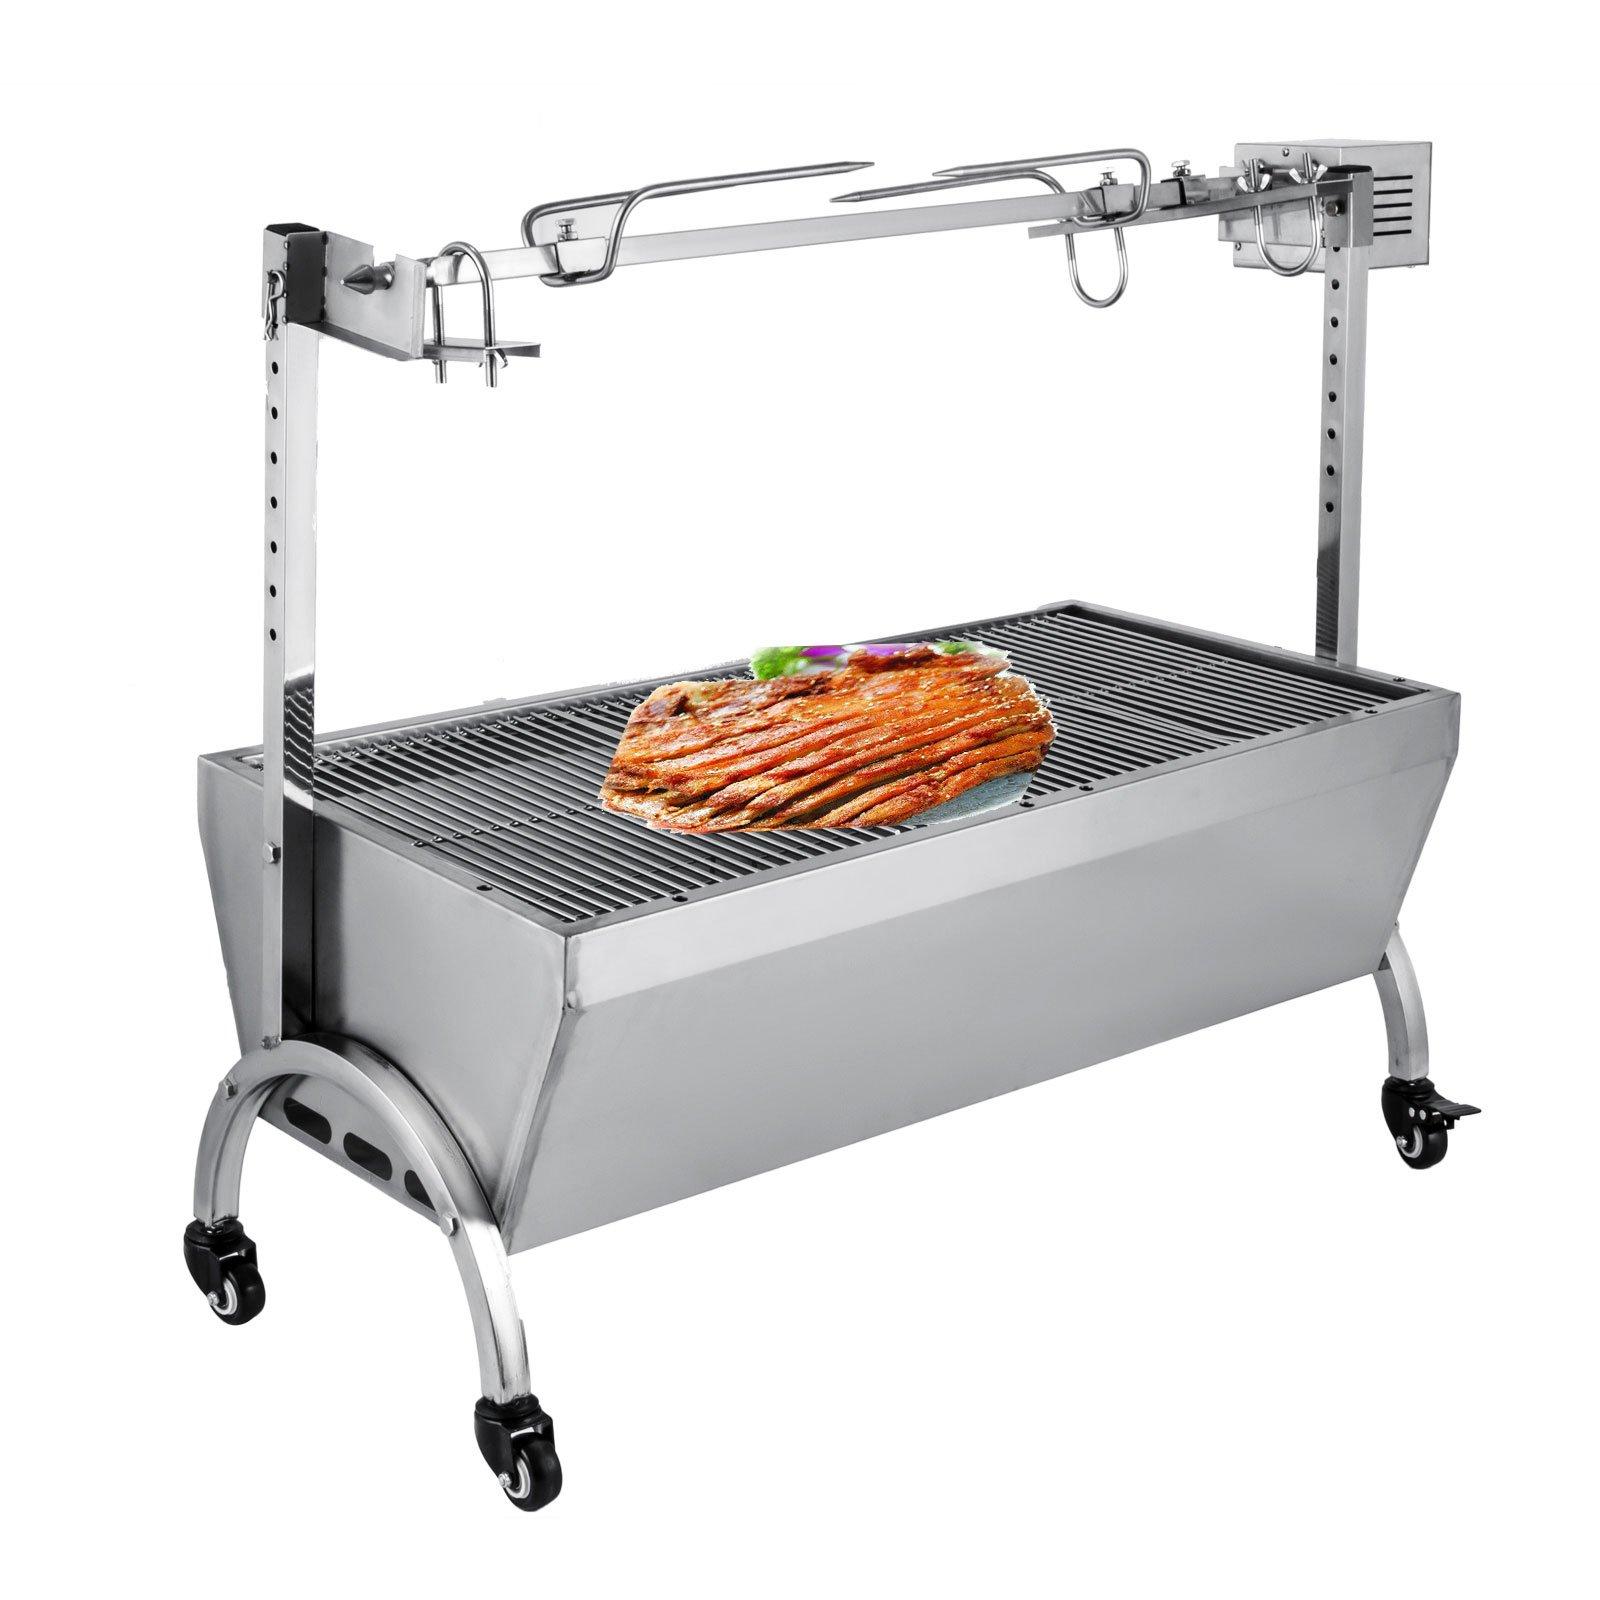 OrangeA 18W BBQ Pig Lamb Rotisserie Roaster Skewer Roast Grill Motor 110V, Capacity 88Lbs/40KG